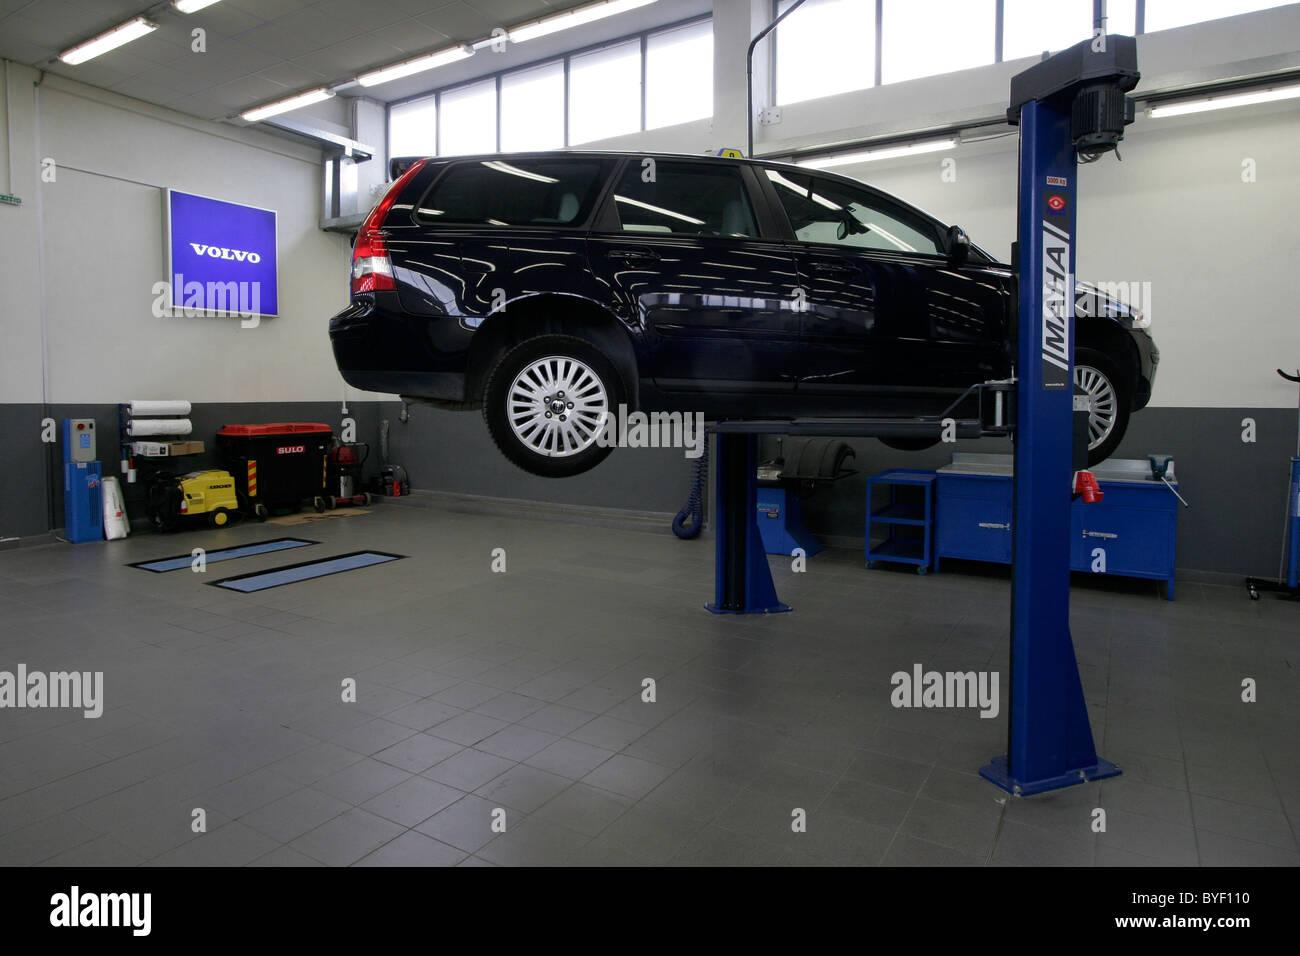 Volvo garage in Athens Greece Stock Photo: 34136172 - Alamy